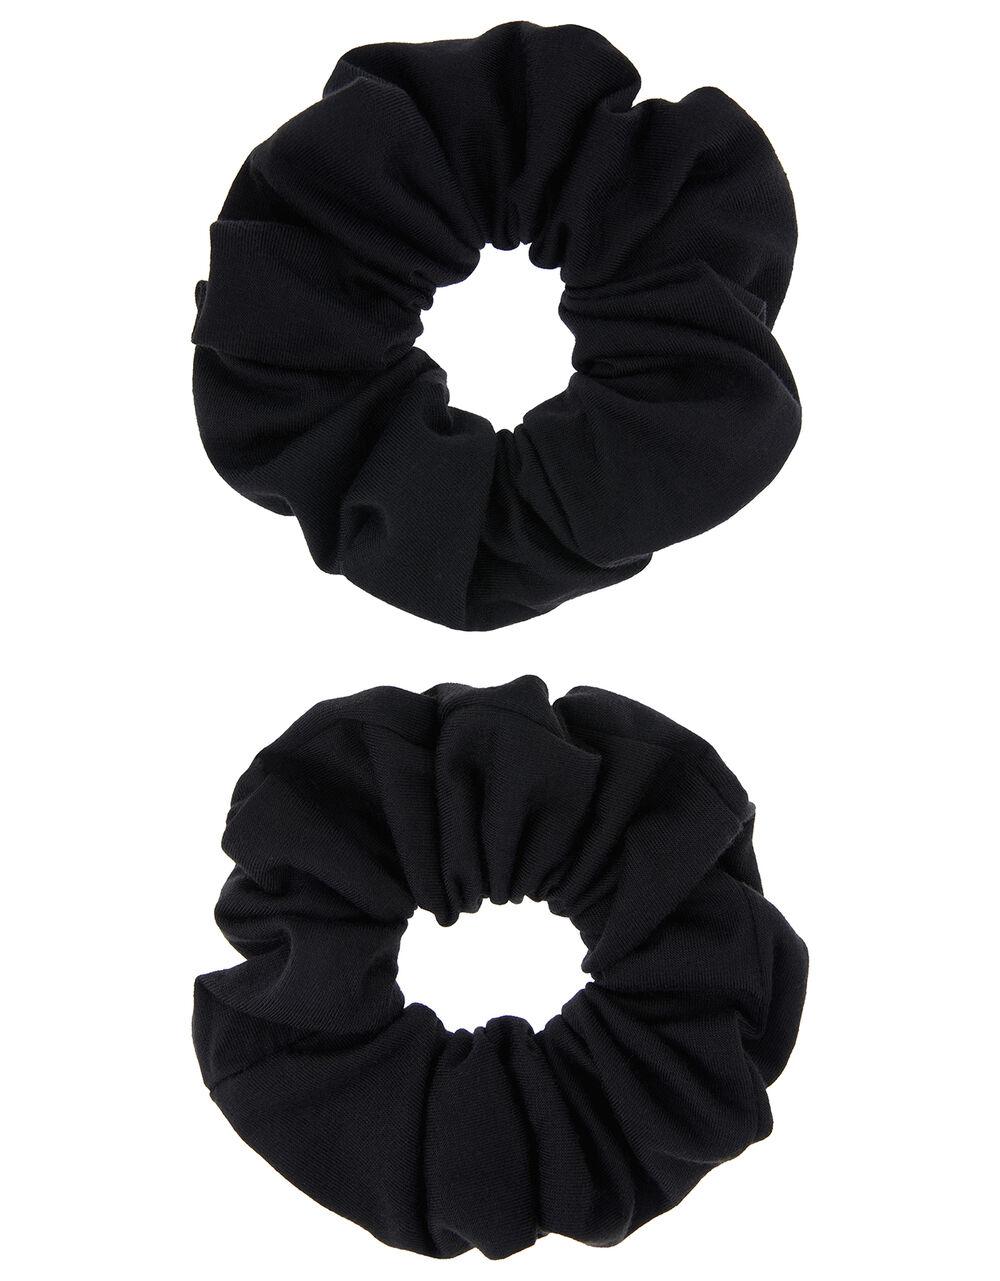 Large Hair Scrunchie Set, , large